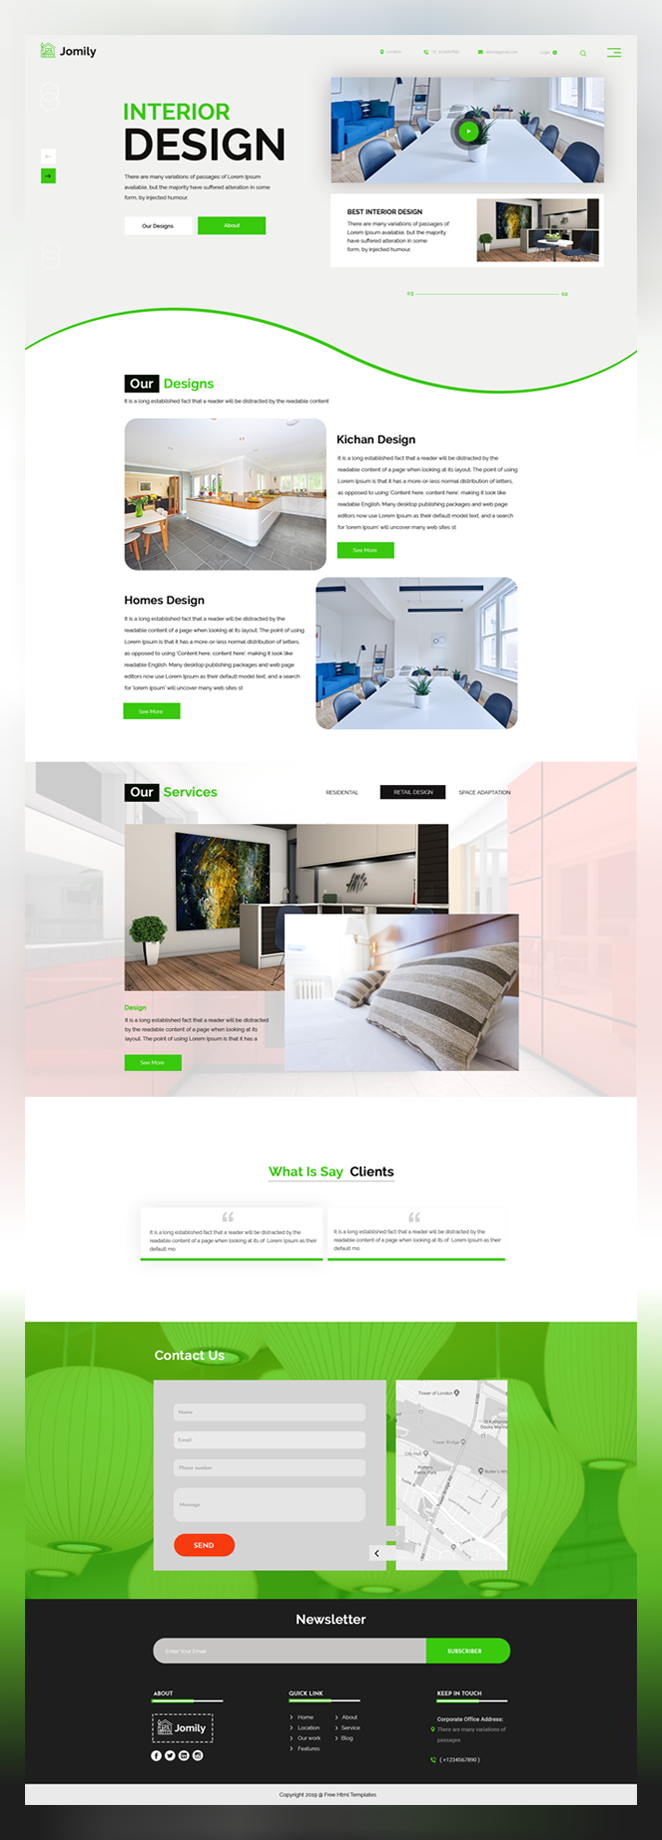 Jomily interior design psd template